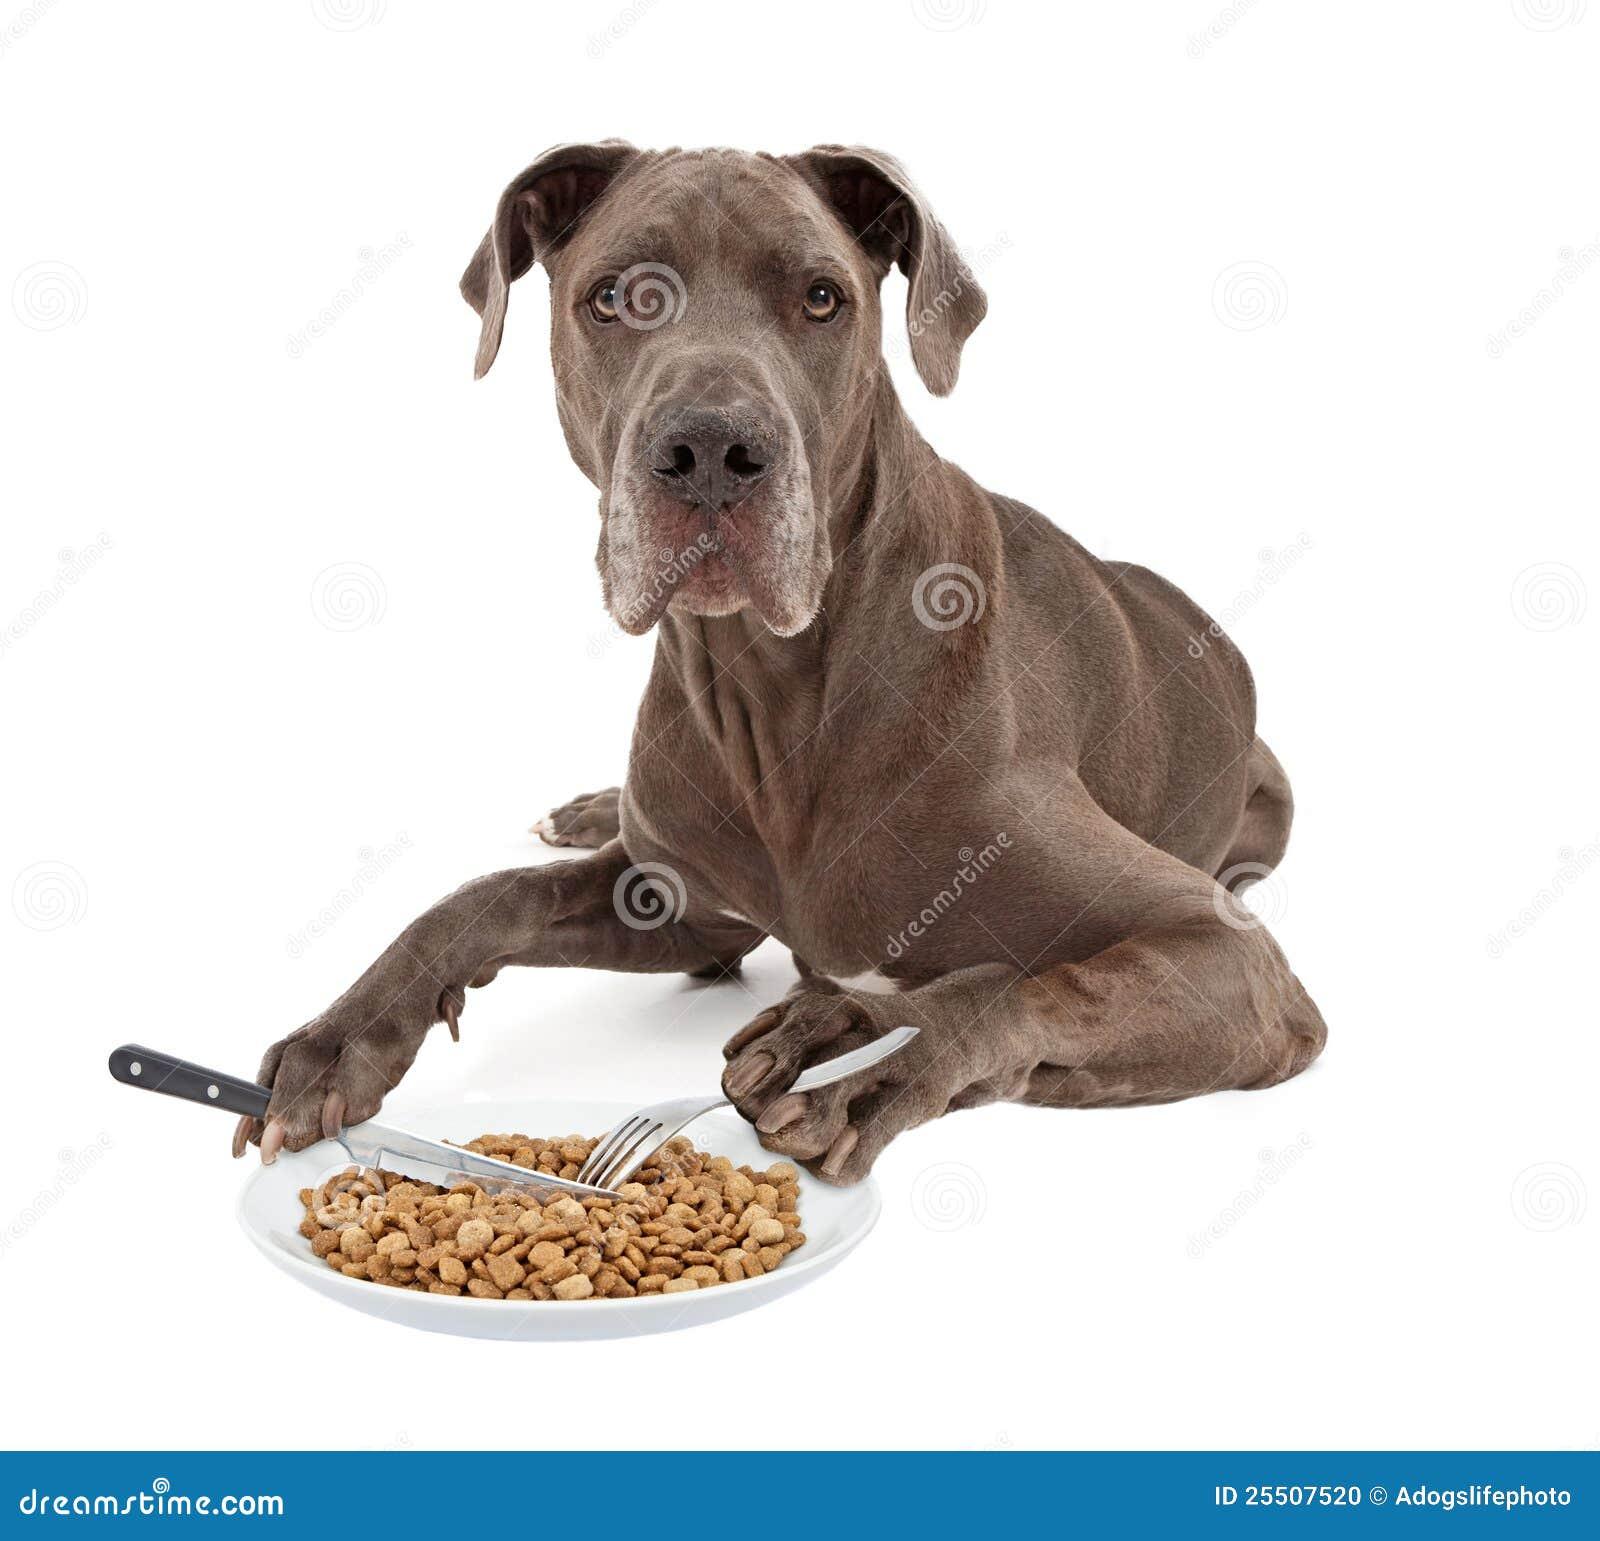 Raw Dog Food For Great Dane